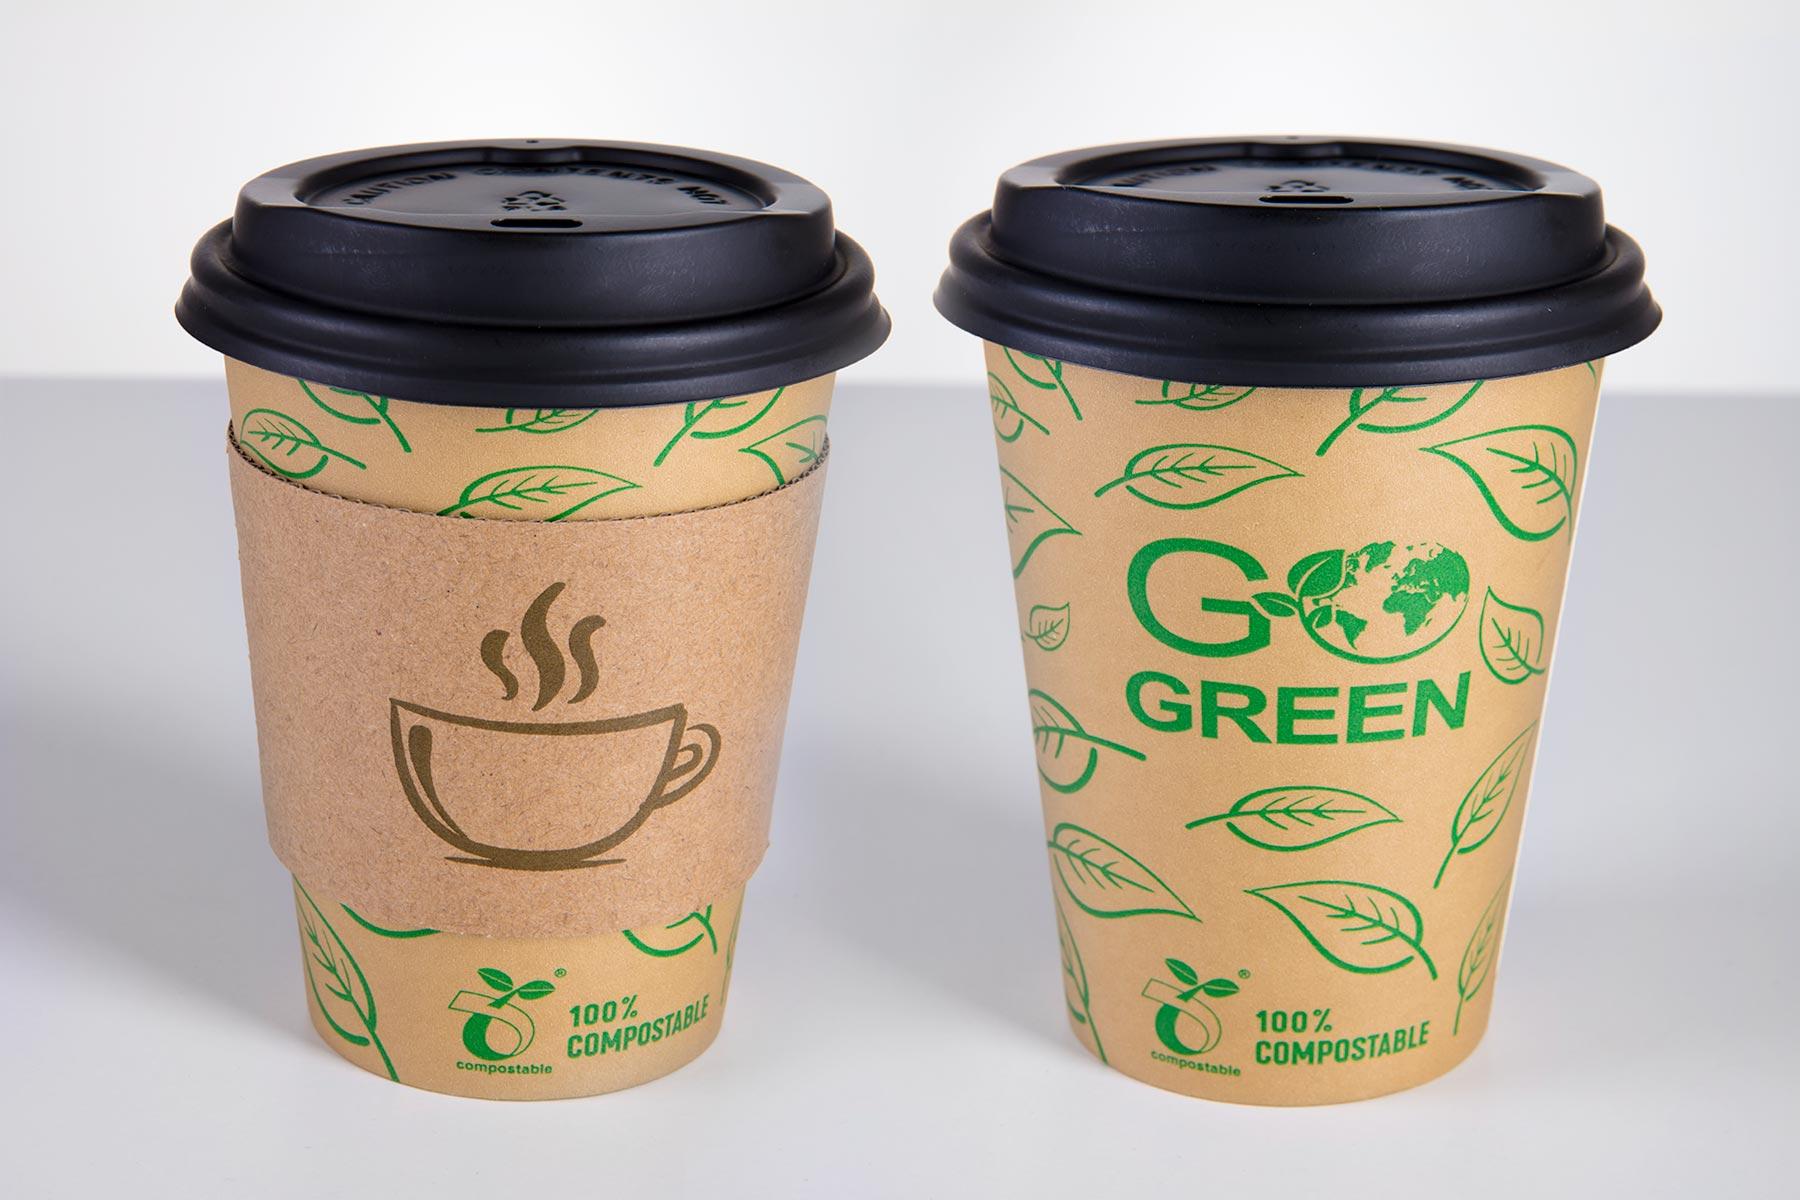 Go Green tooteseeria - Ursus OÜ